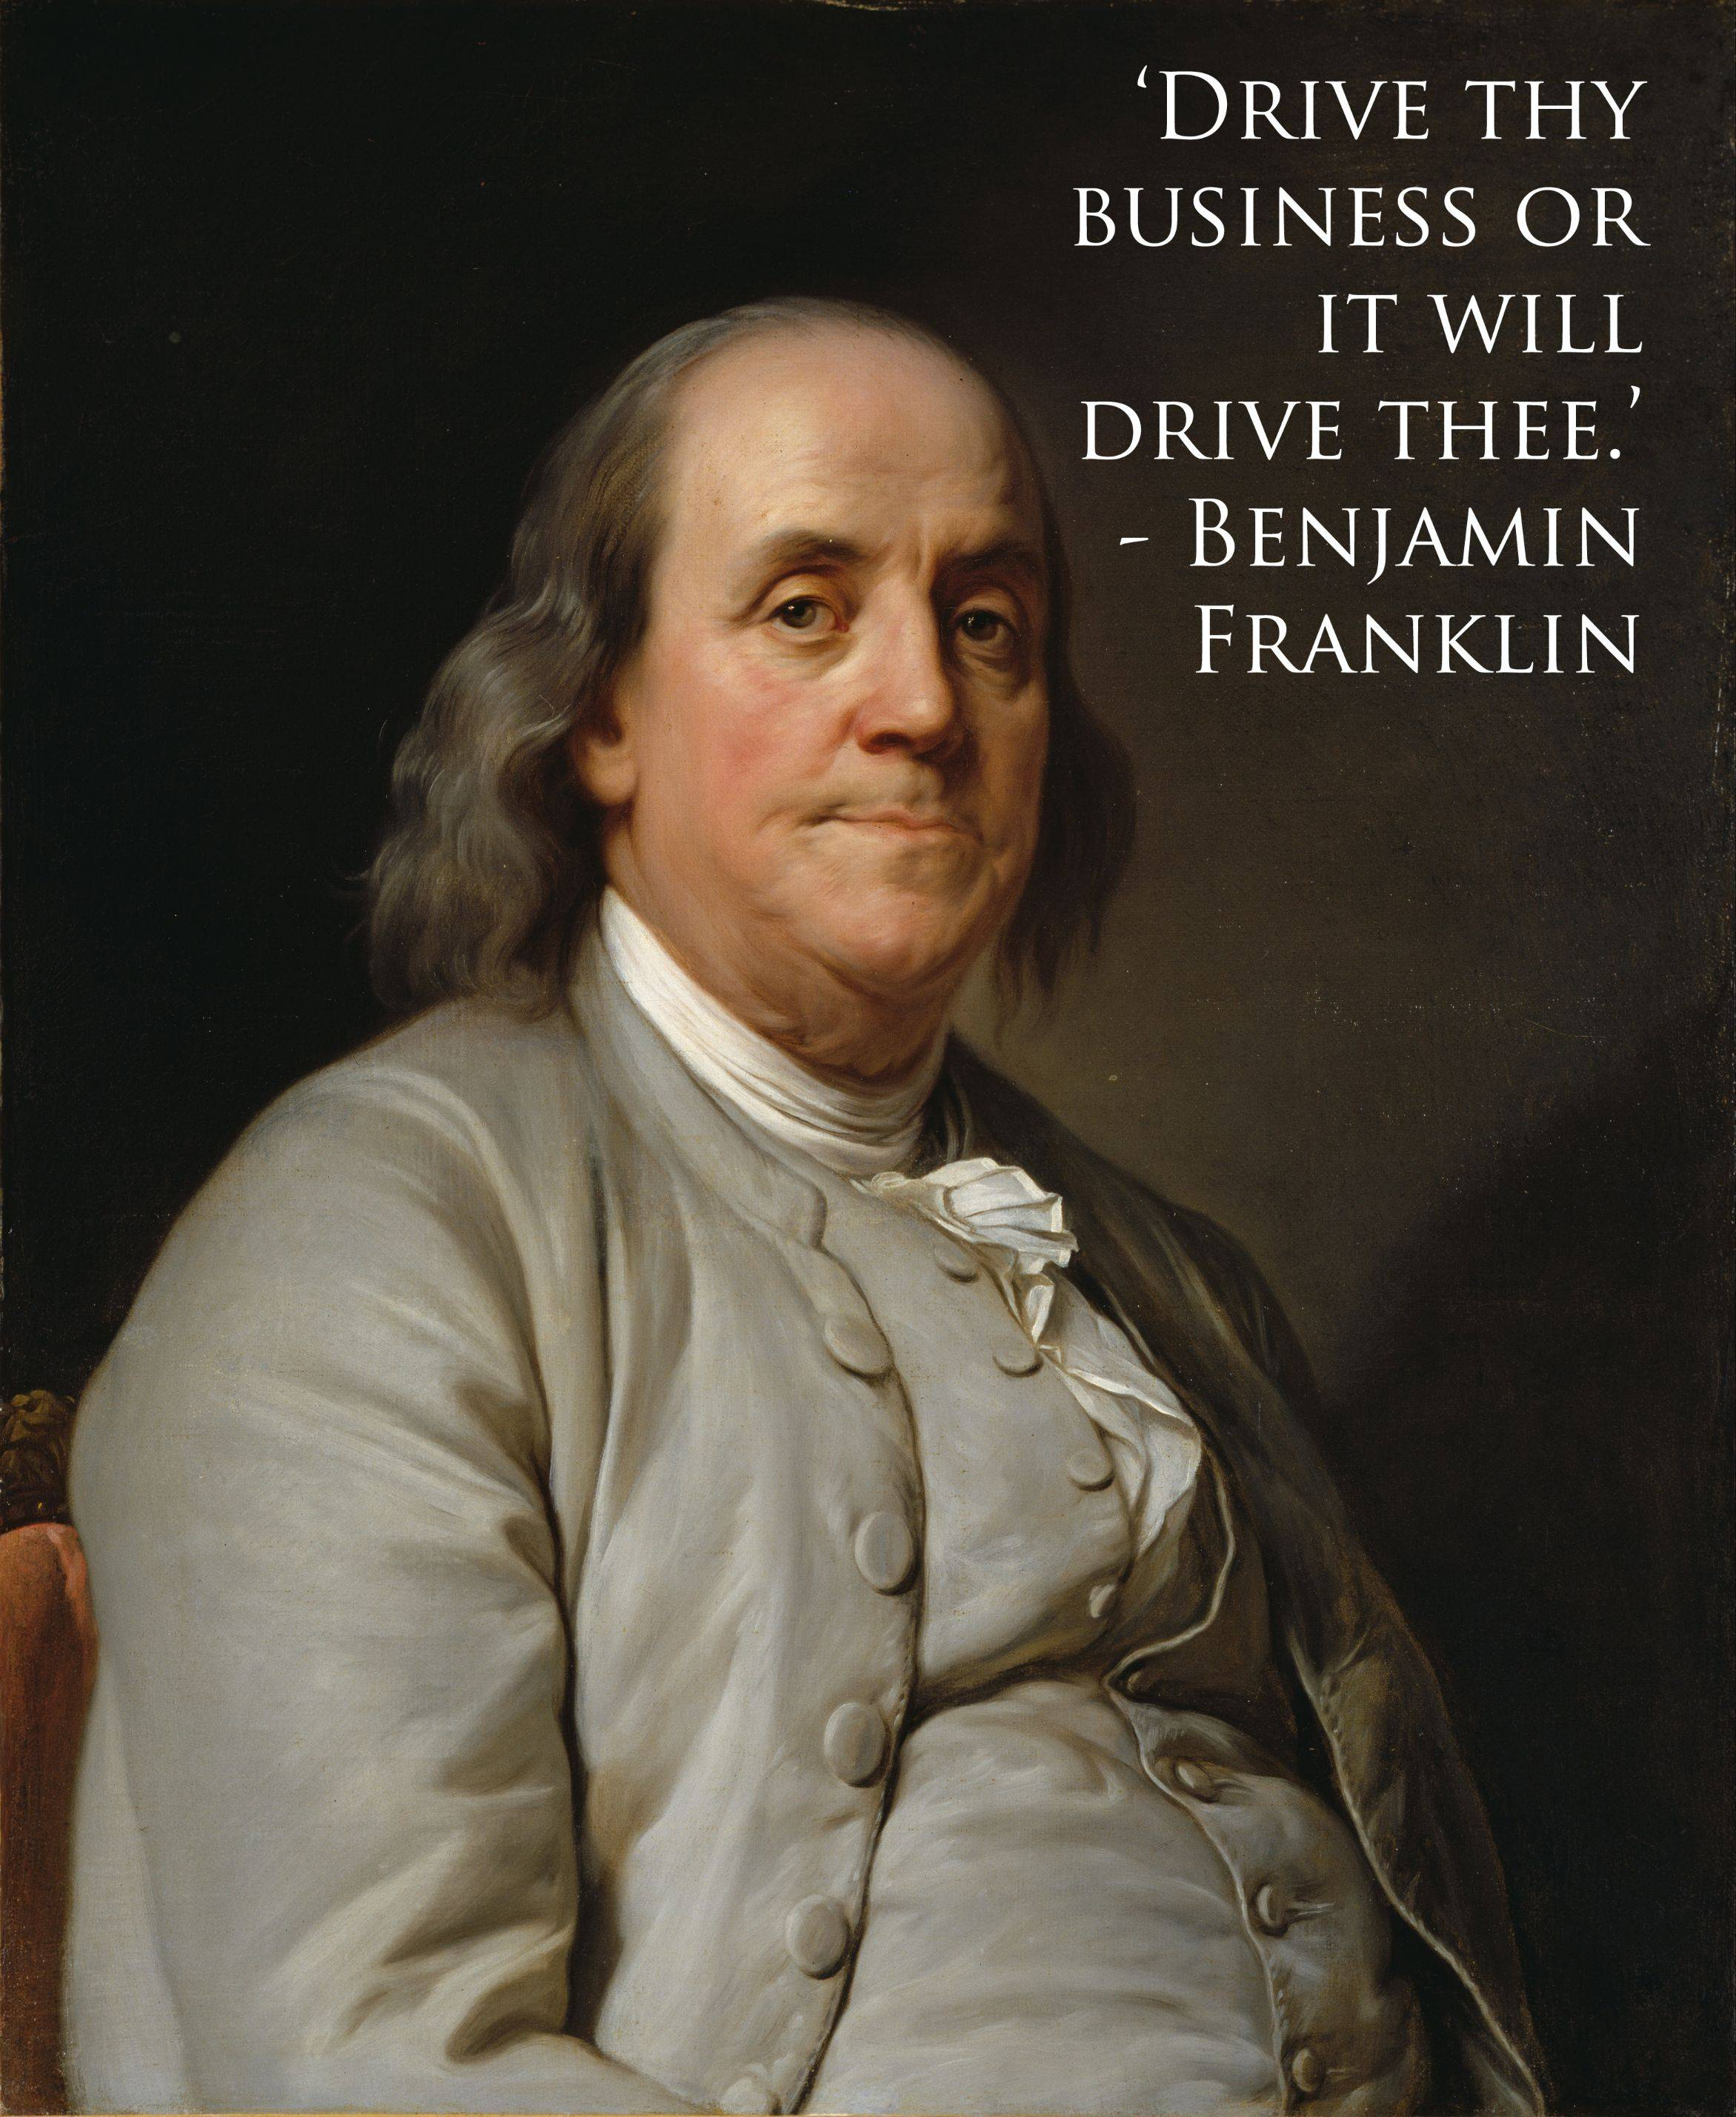 Franklin quote #1